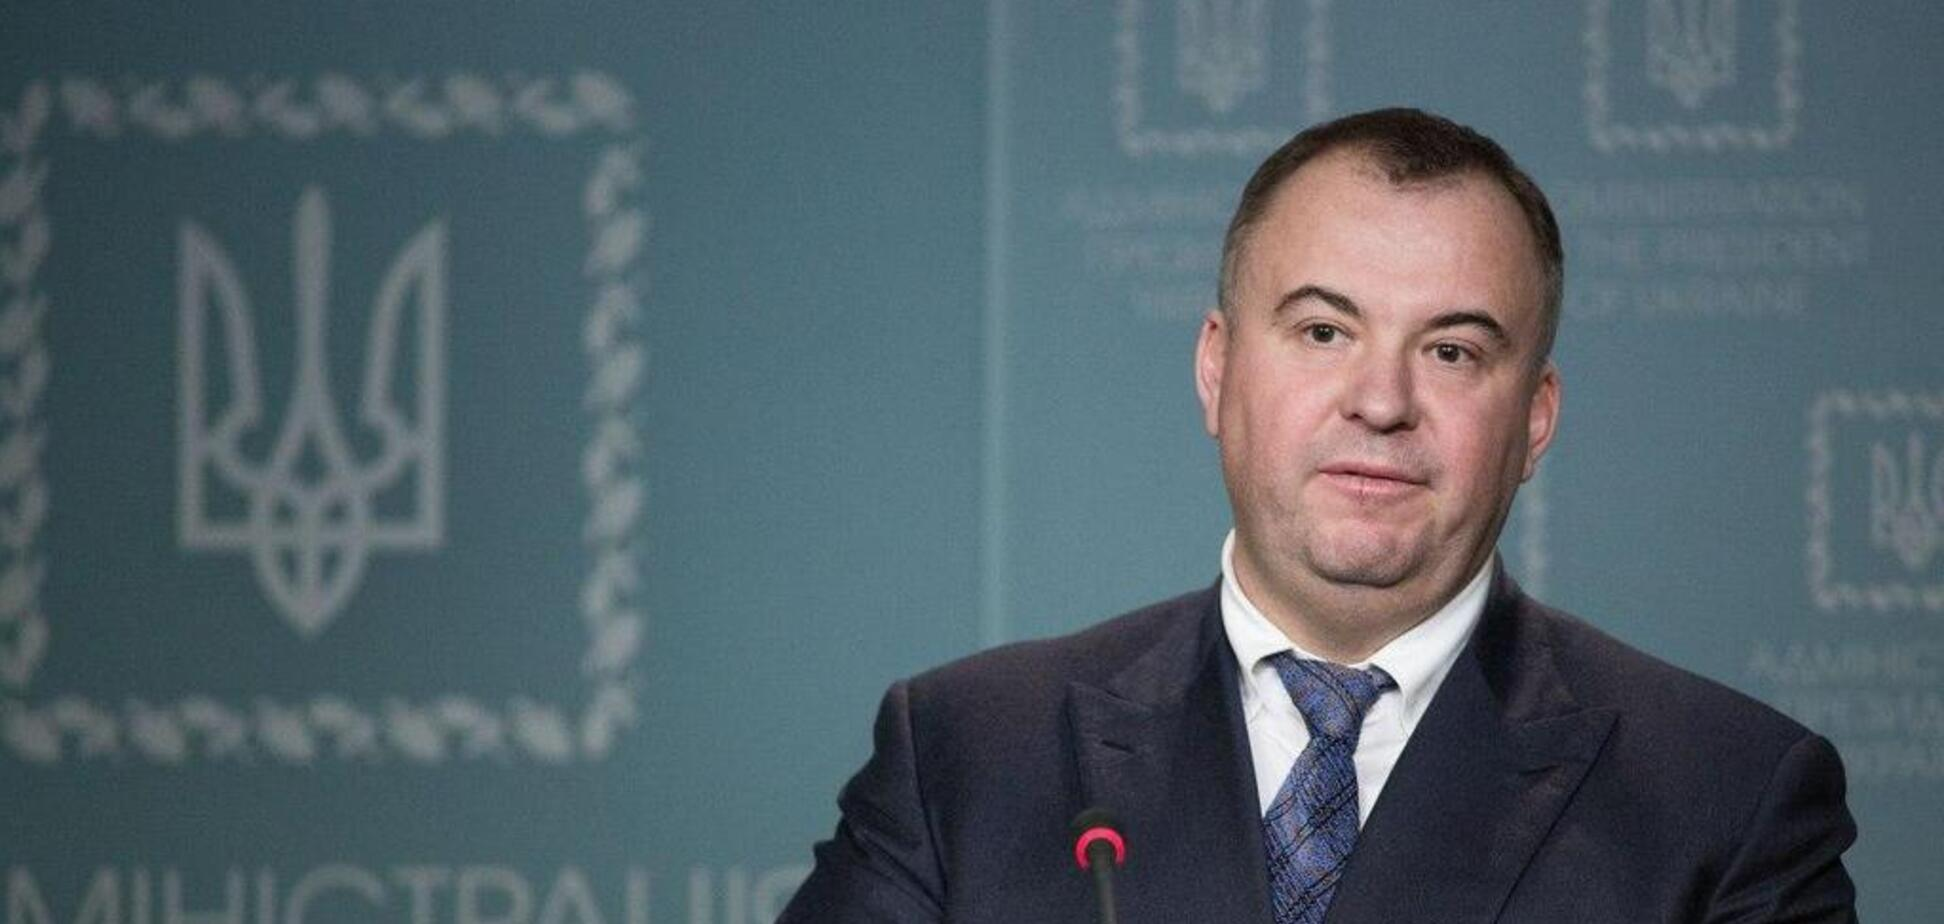 Гладковский объявил голодовку из-за задержания НАБУ